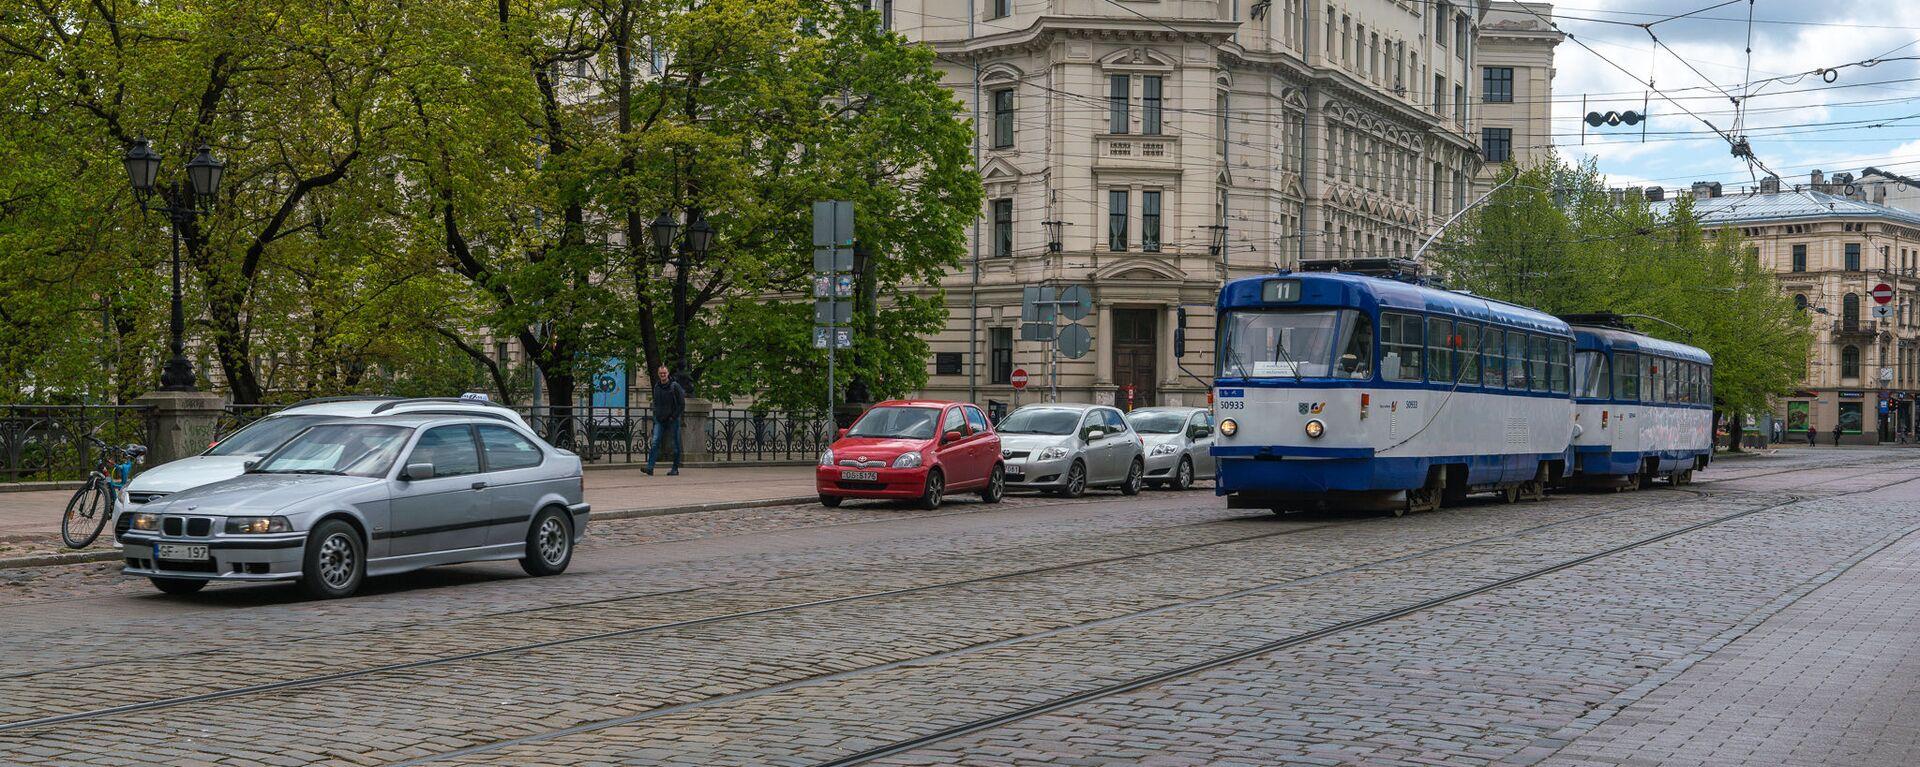 Улица Кришьяня Барона - Sputnik Латвия, 1920, 06.07.2021